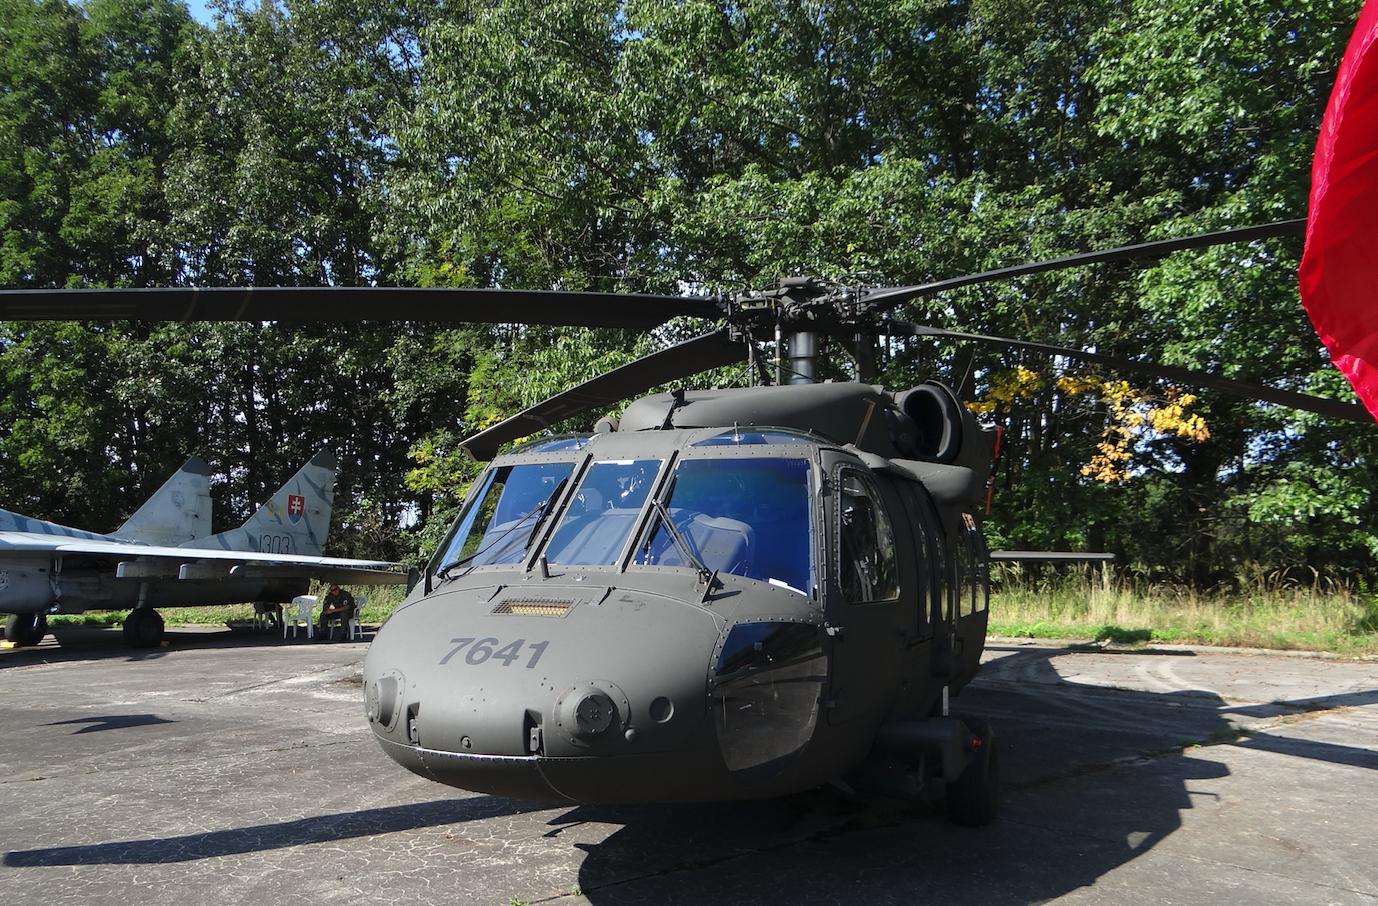 Black Hawk USAF. 2018. Photo by Karol Placha Hetman